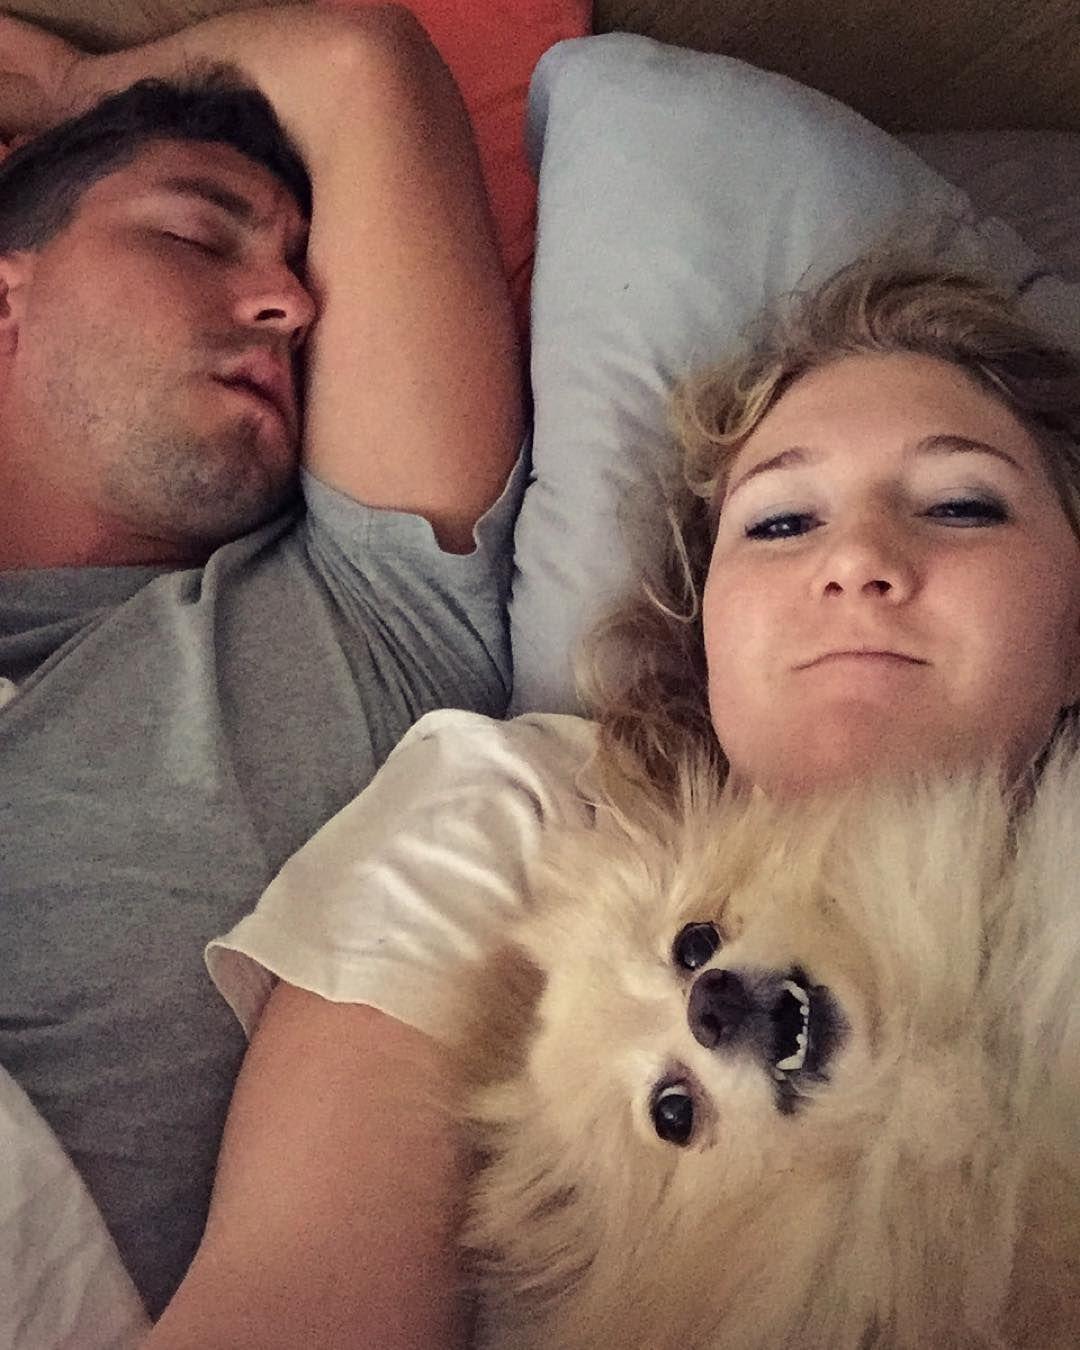 Meet the fam. #happysunday #puppylove #lifeisgood